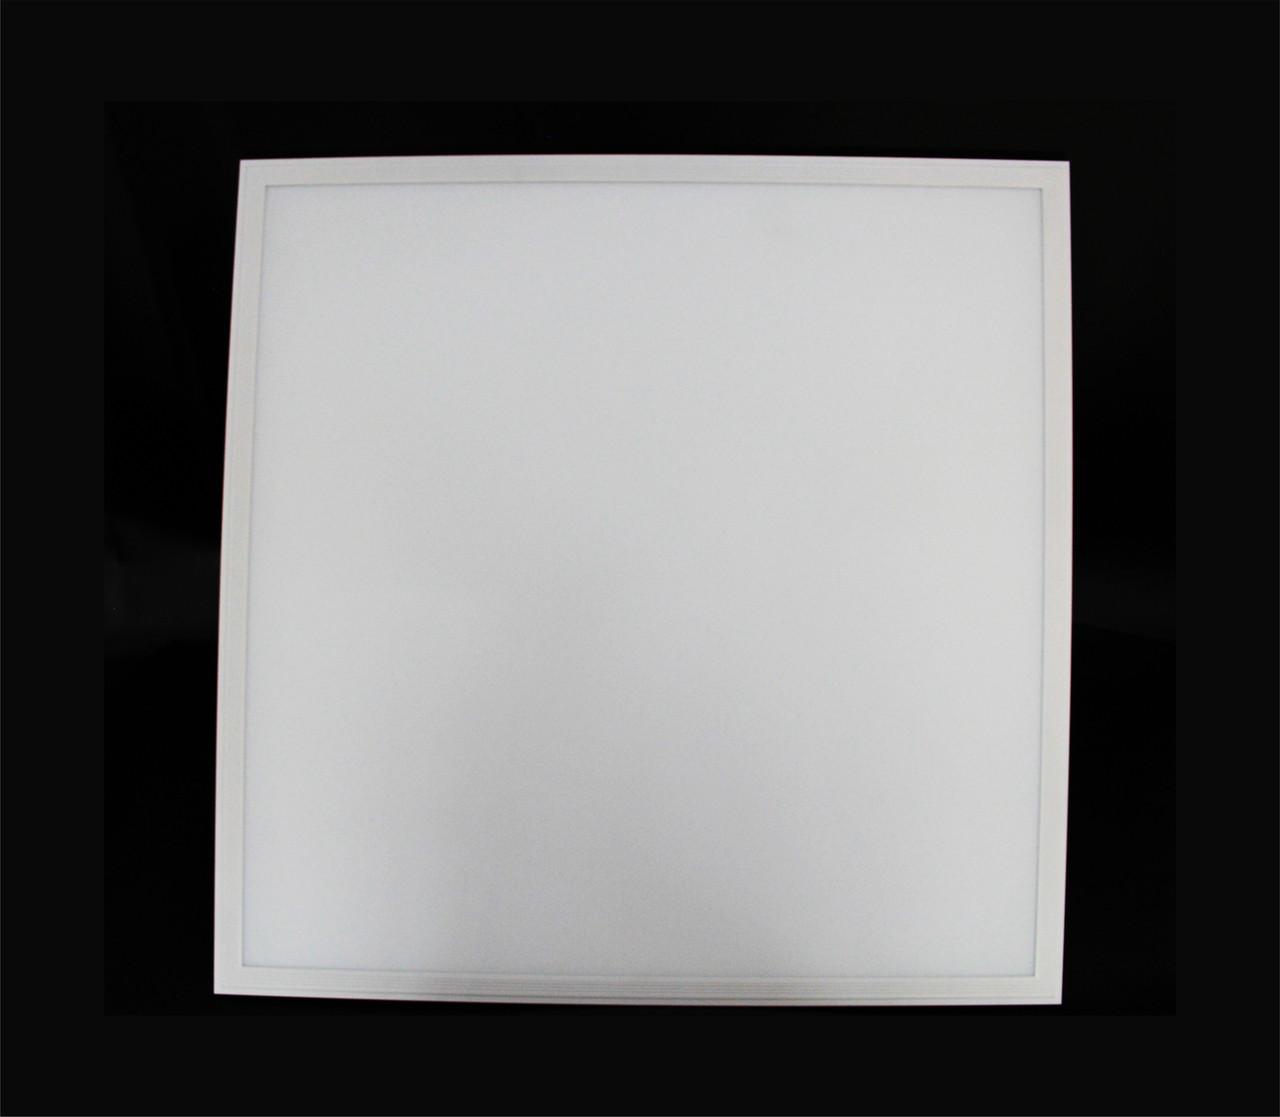 Светильник LED ДВО FOLIO 45w/3200Lm